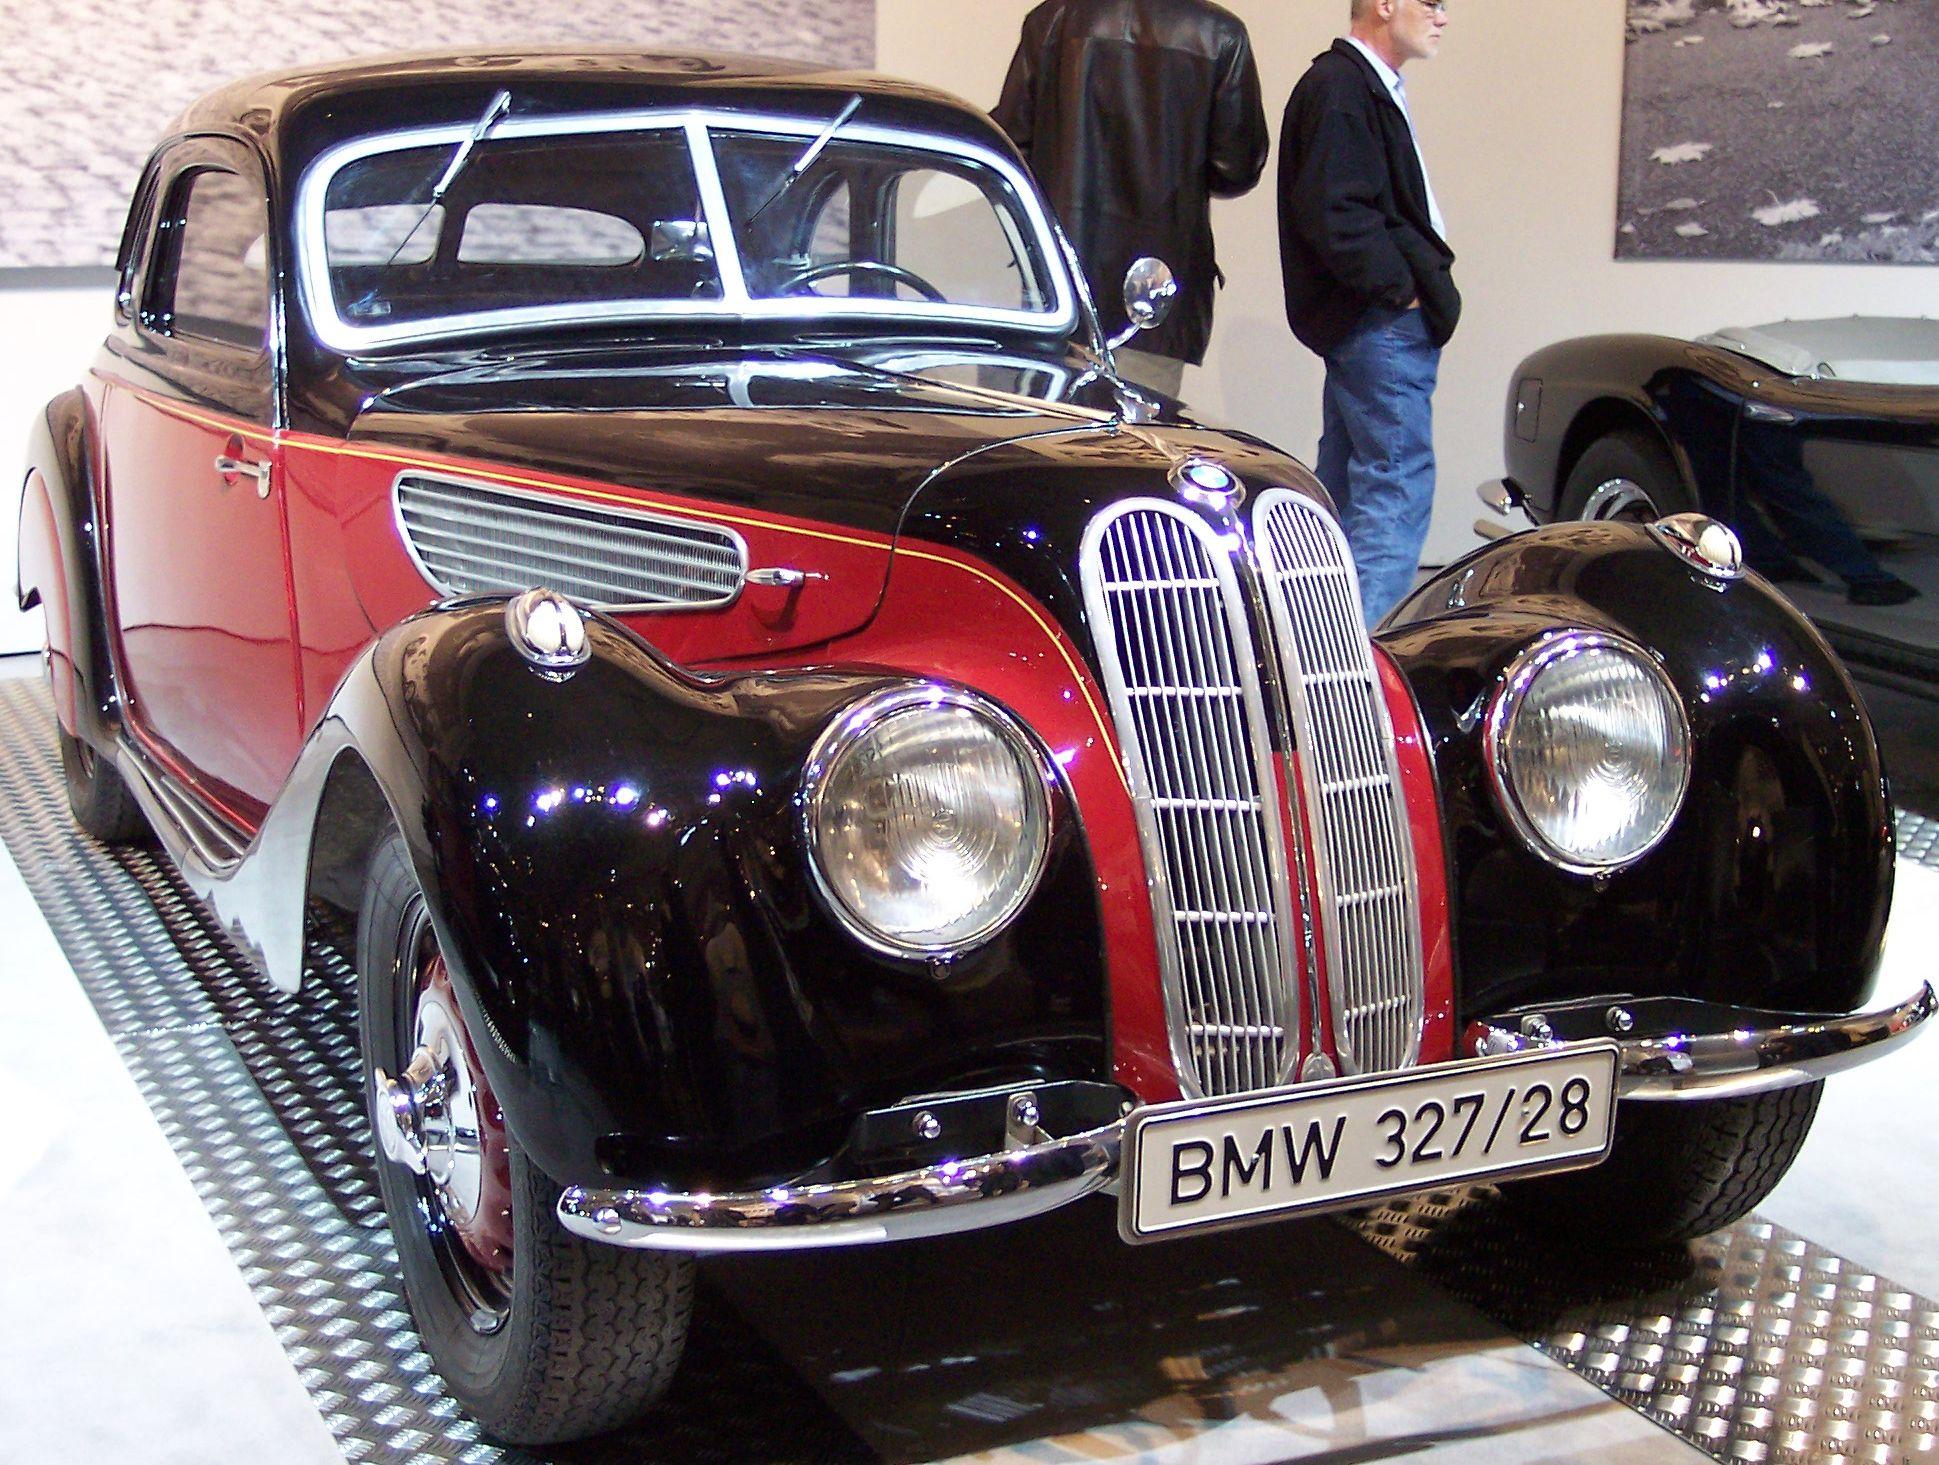 File:BMW 327-328 1937 bicolor vr TCE.jpg